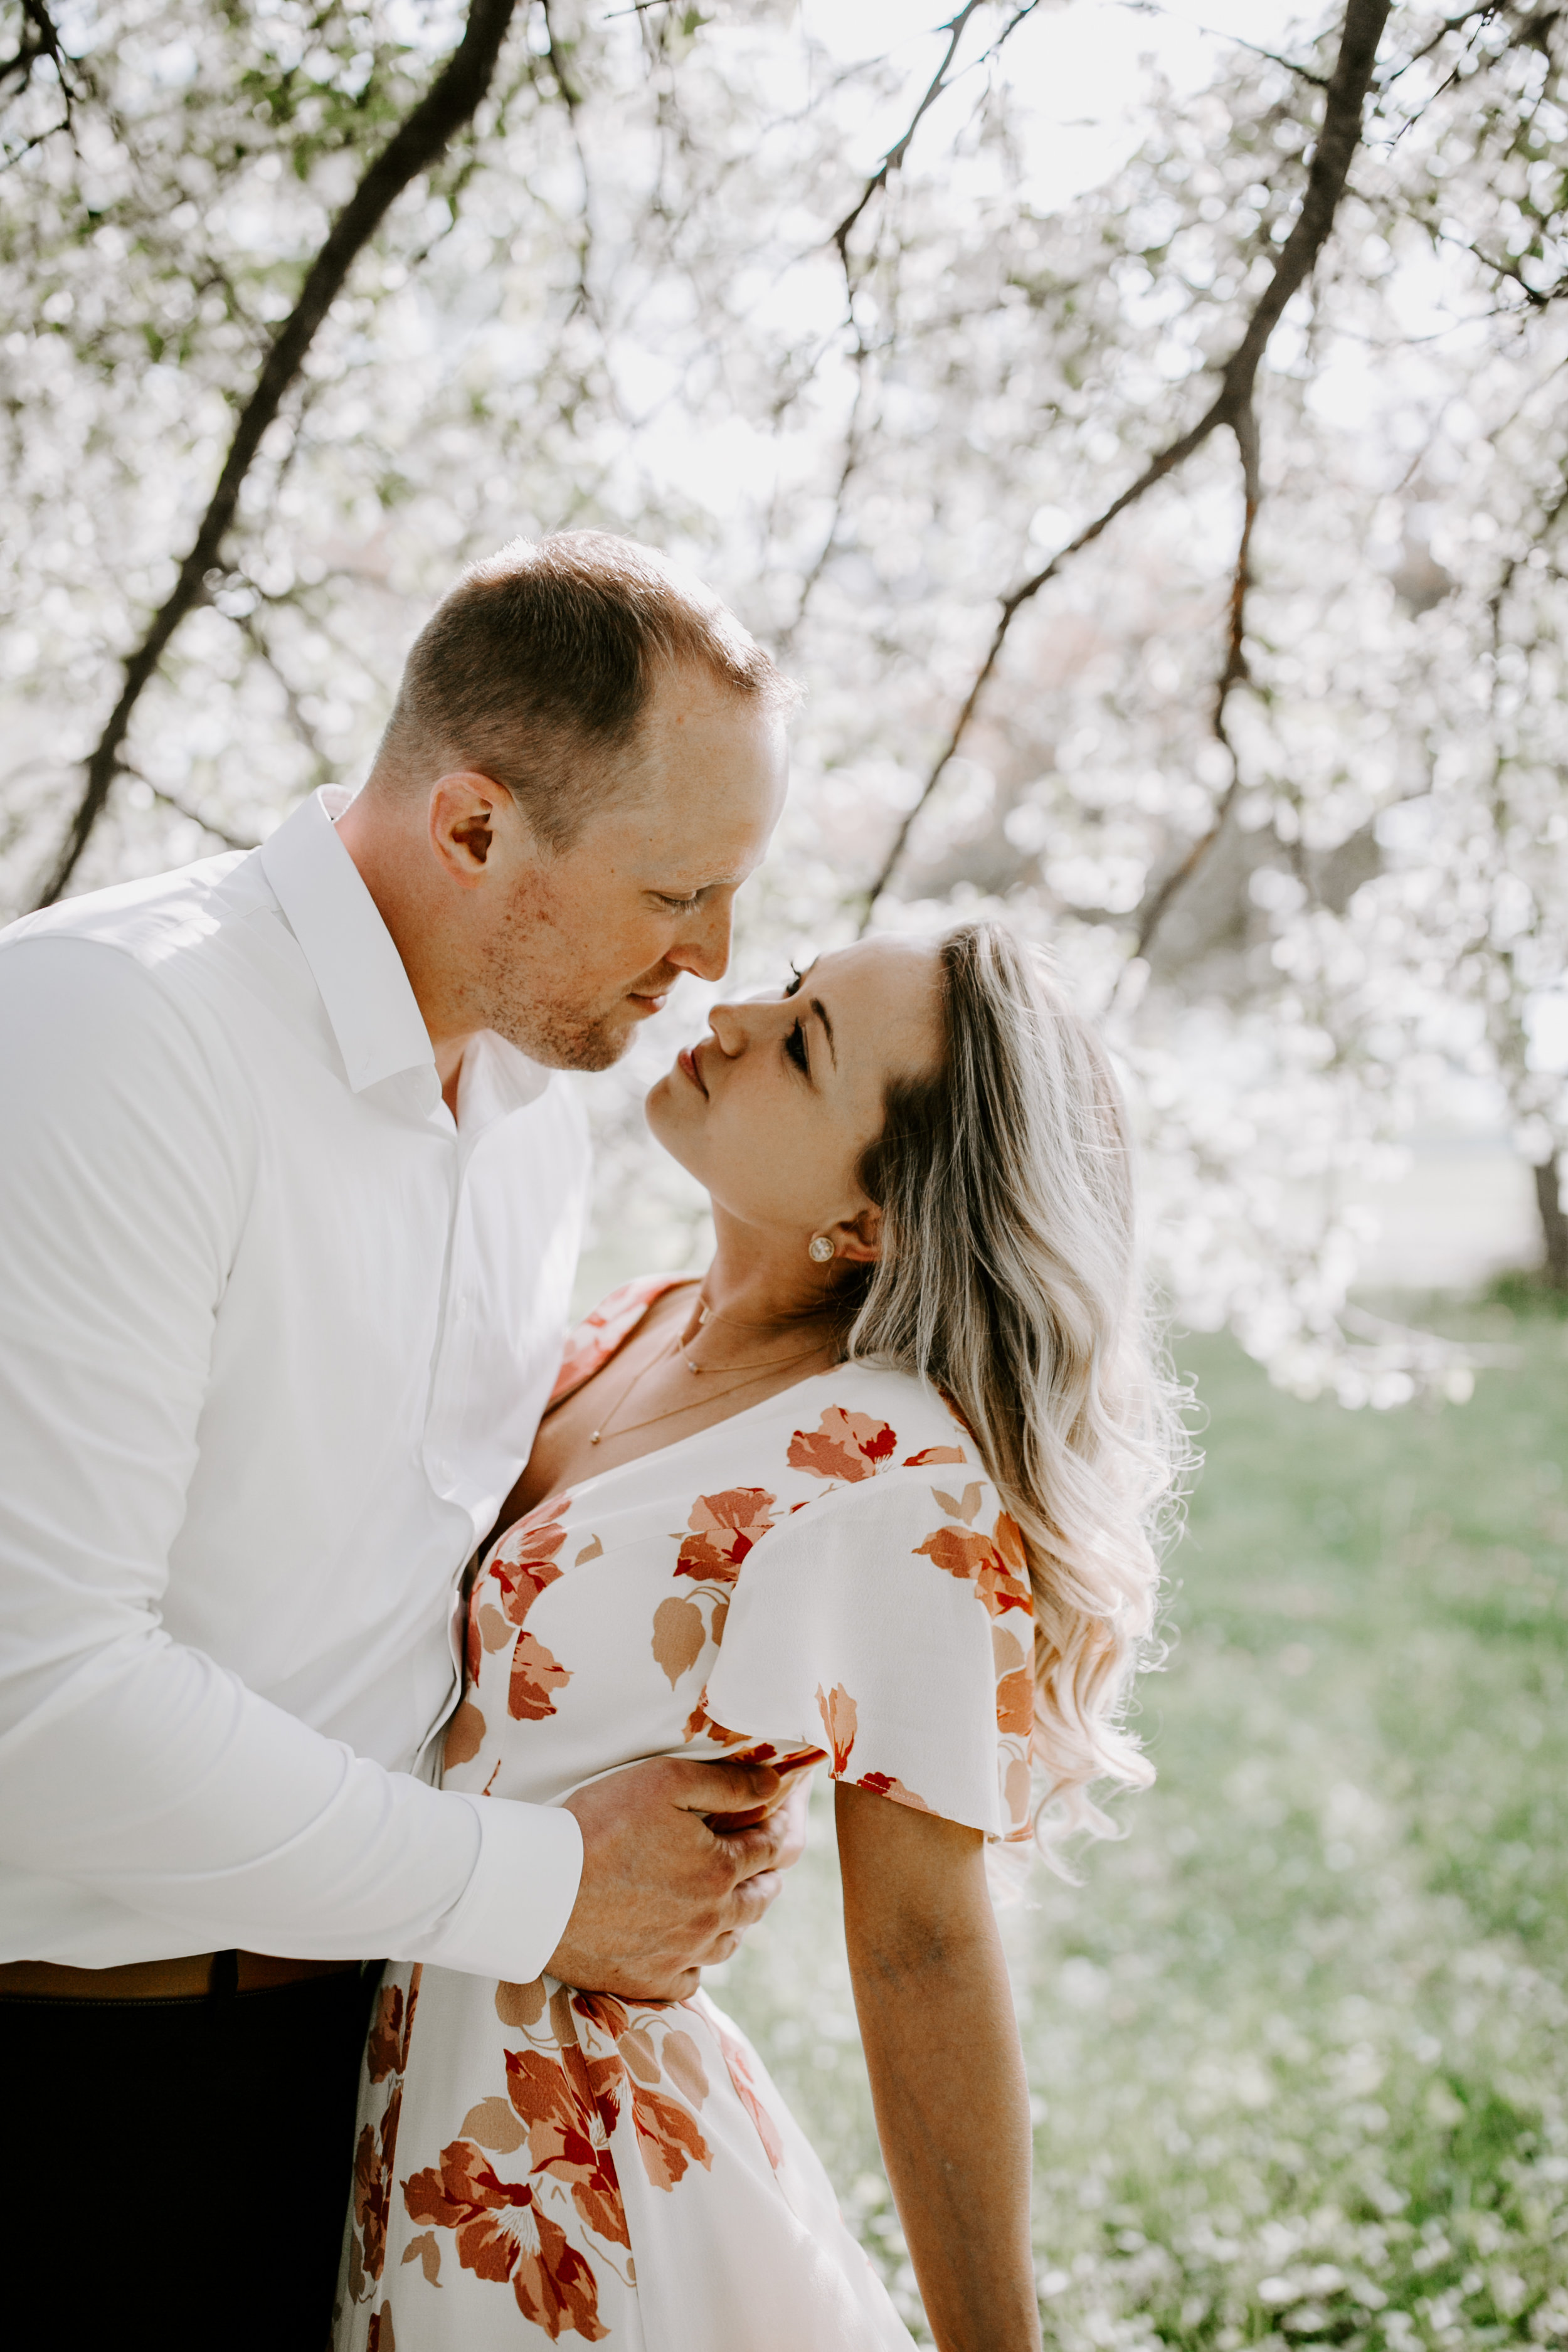 gracetphotography-wedding-photographer-adventure-bride-engagement-midwest-9.jpg